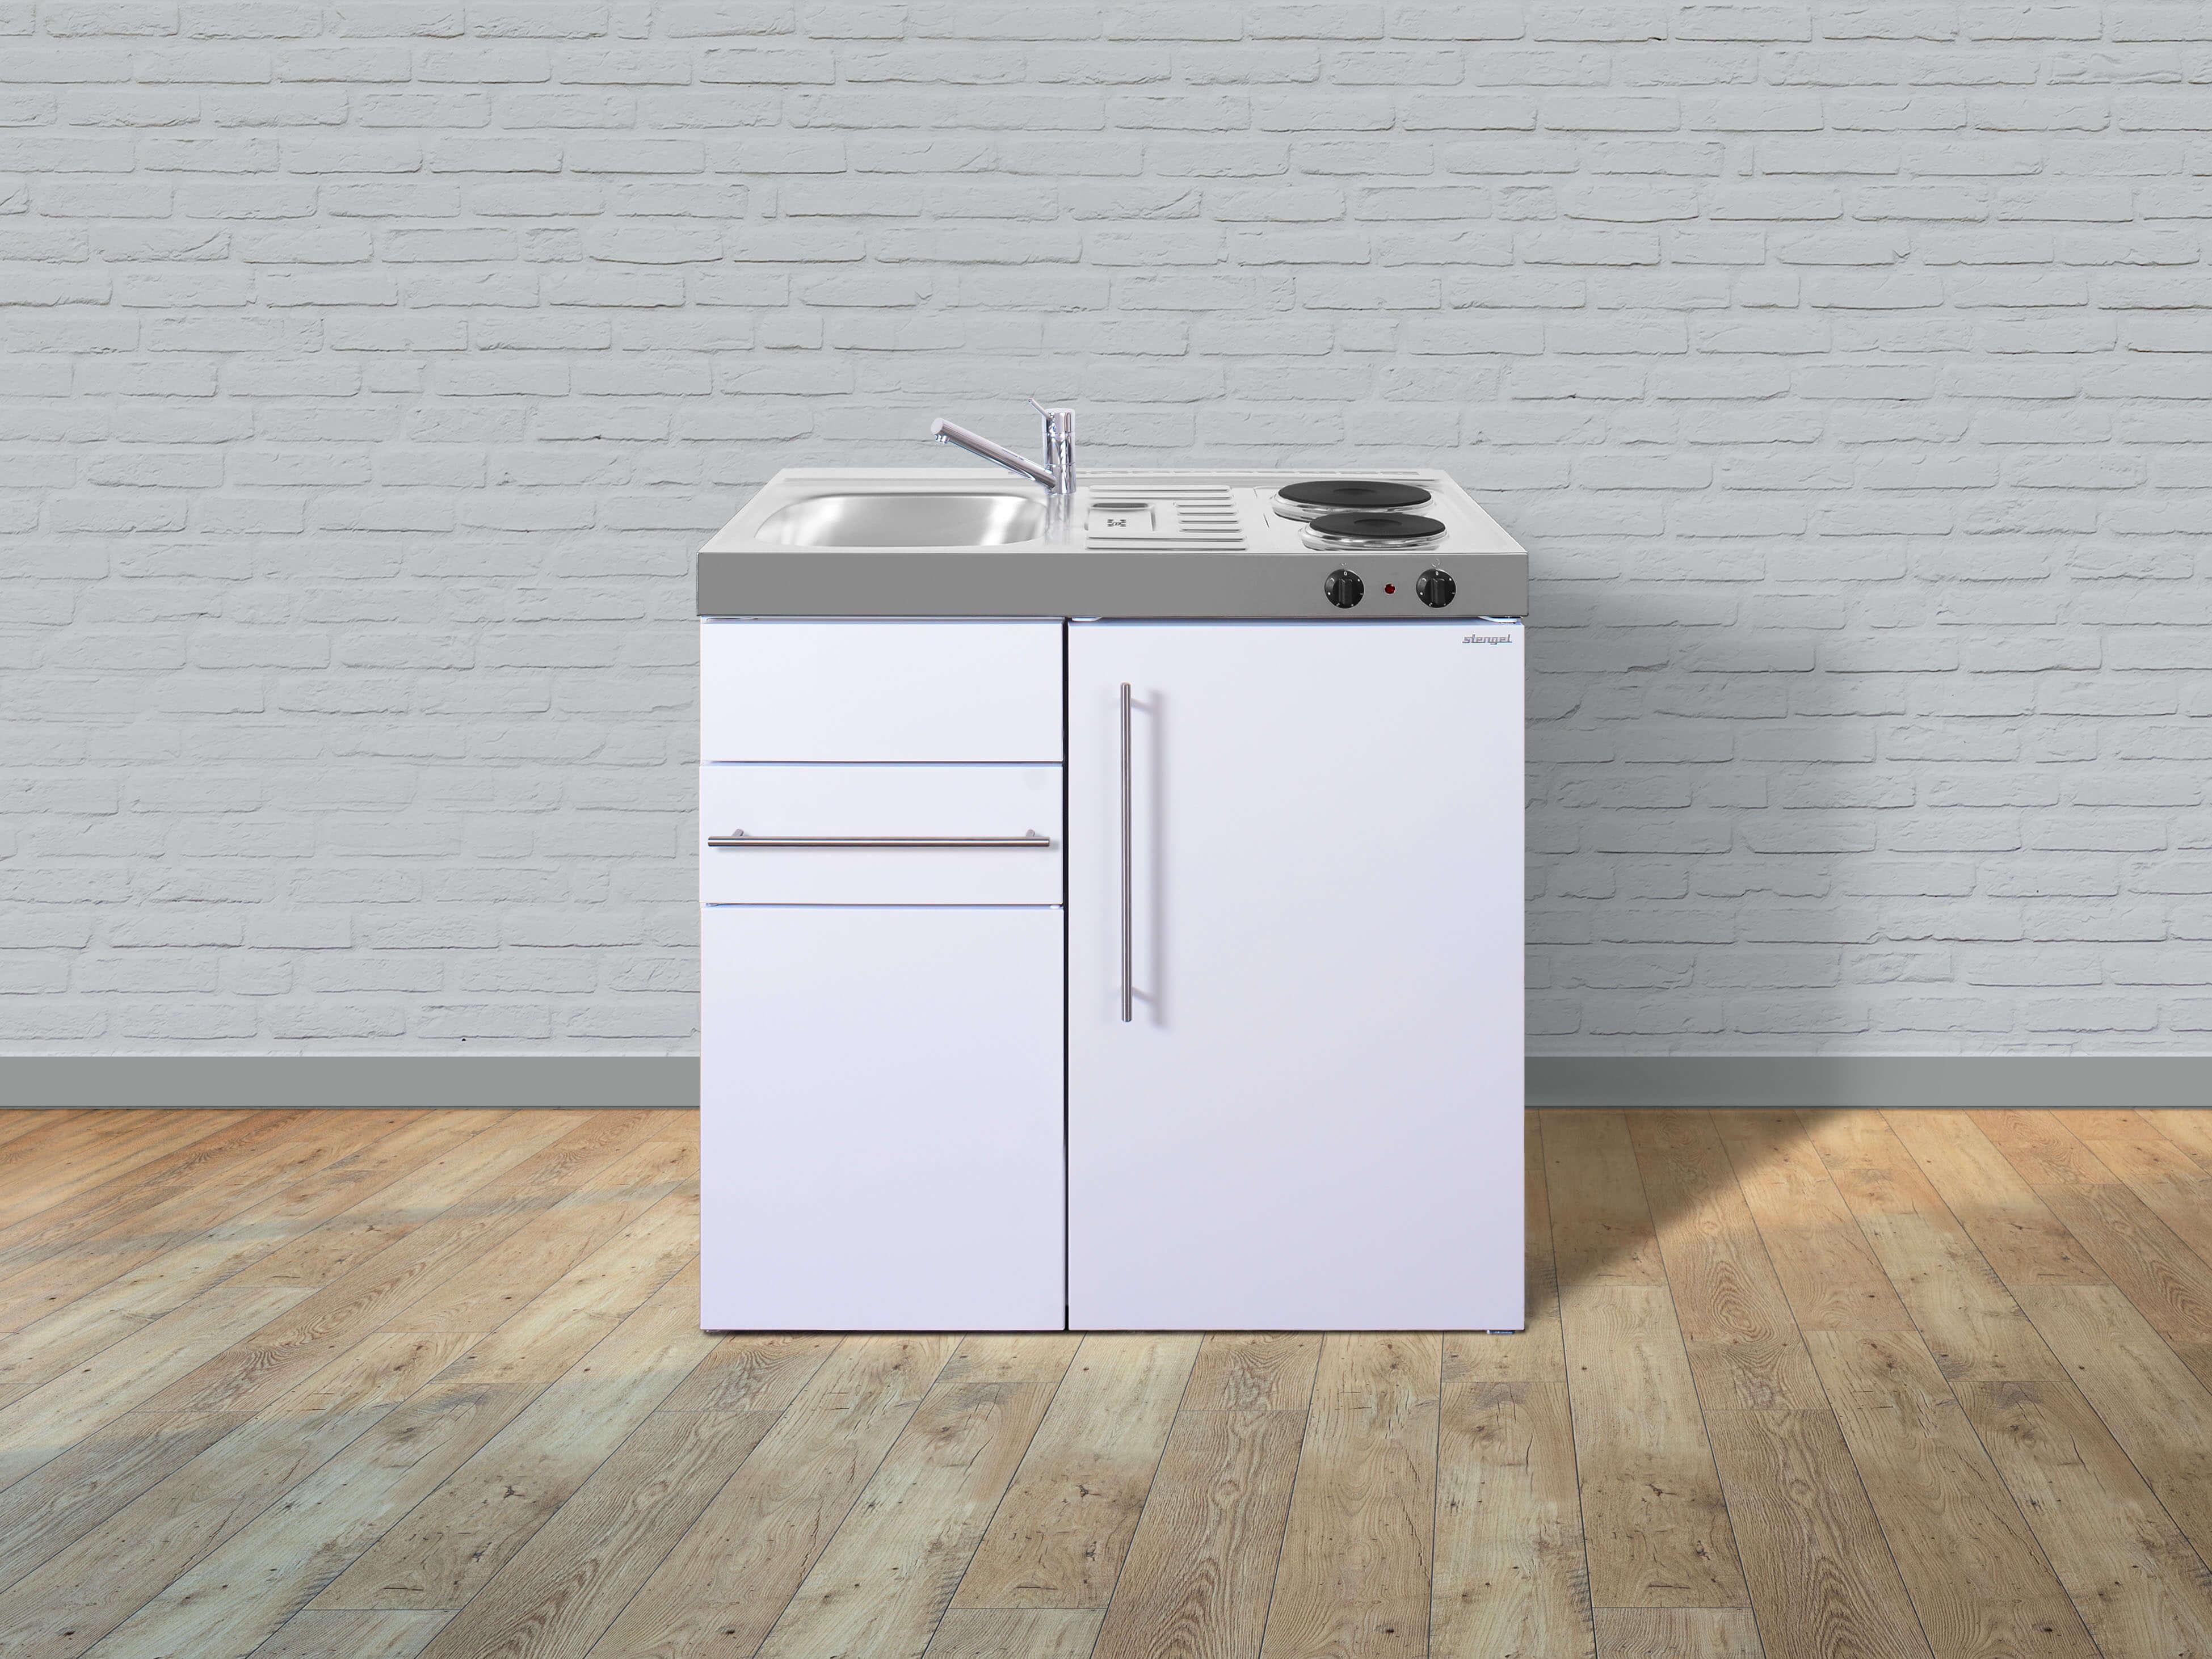 stengel minik che premiumline mp 90 minik chen online. Black Bedroom Furniture Sets. Home Design Ideas